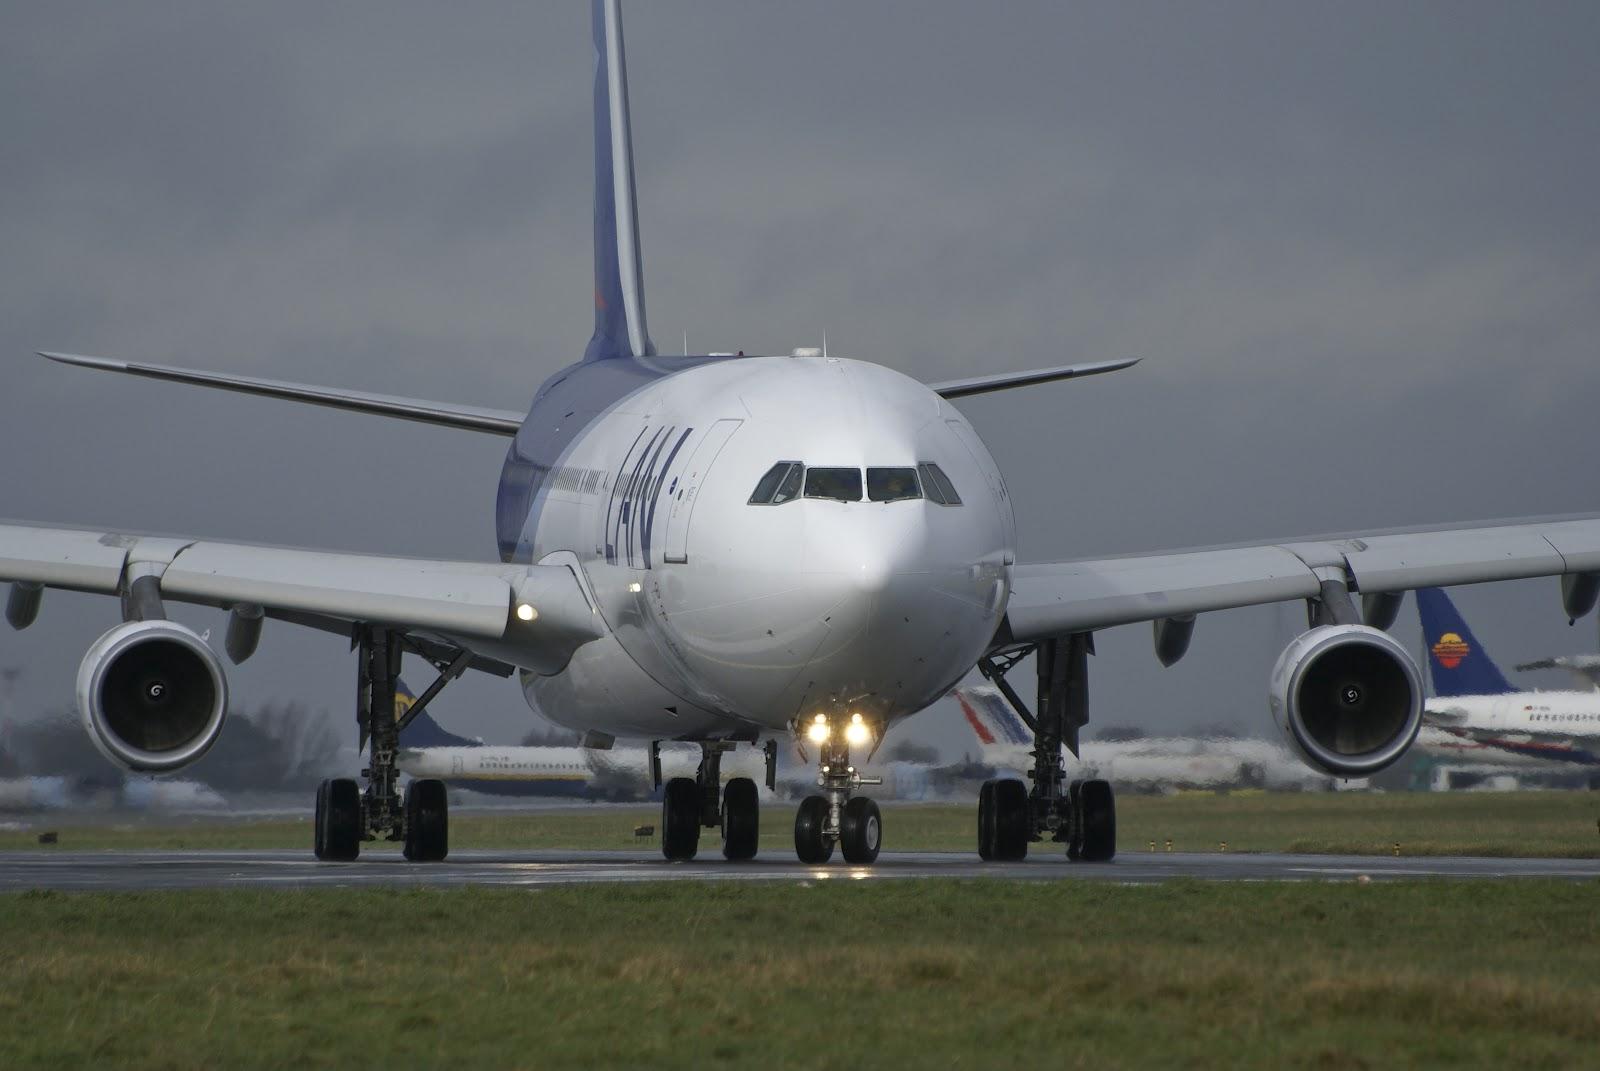 http://4.bp.blogspot.com/-g3qxslgTFQ4/T84qkKRjbHI/AAAAAAAAI7I/gvuoPhYivLU/s1600/airbus_a340-300_lan_airlines.jpg